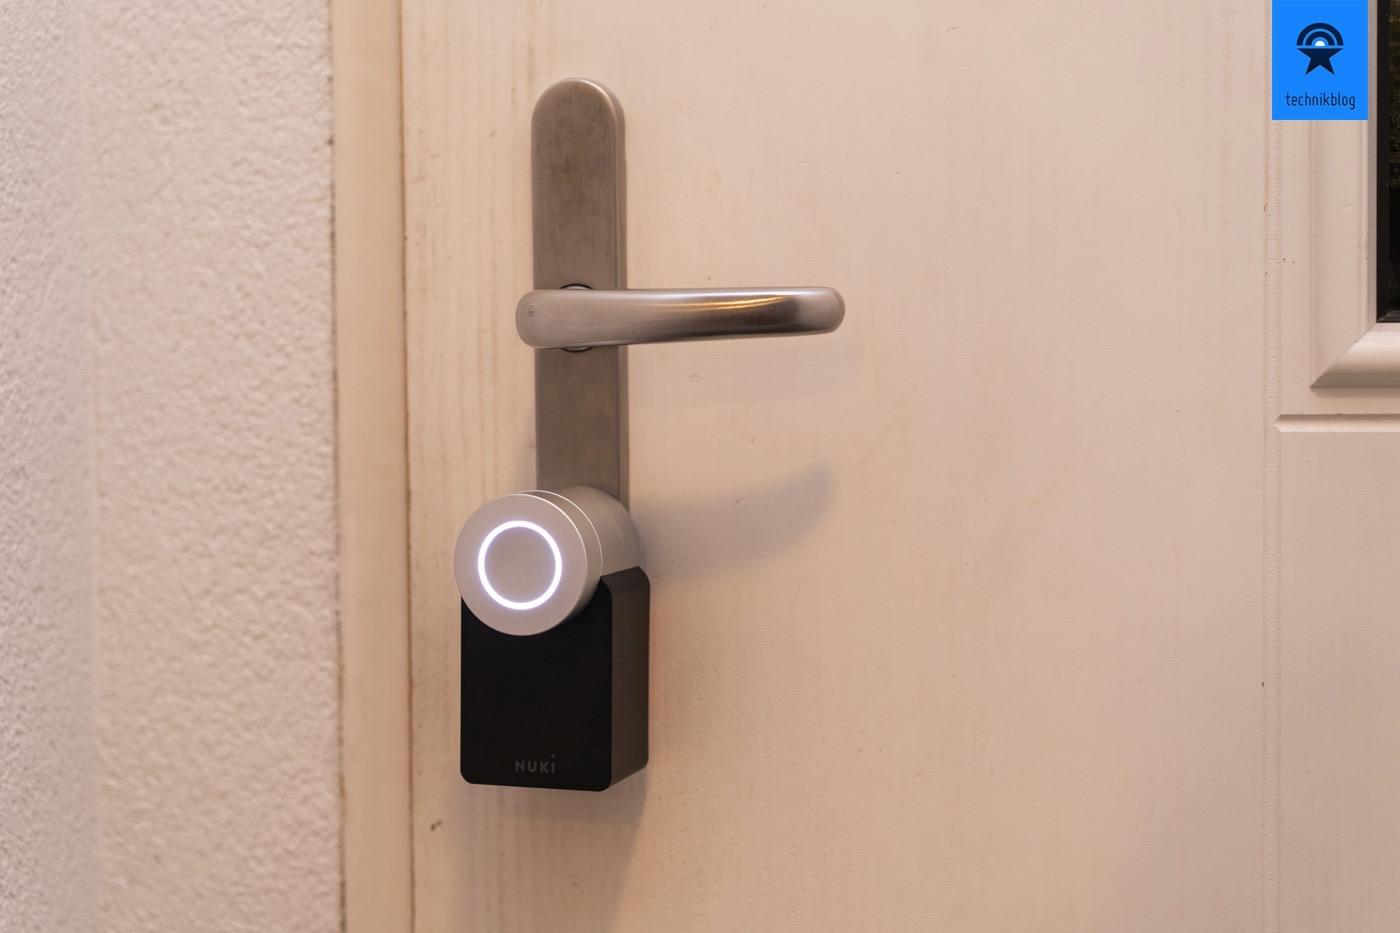 Nuki Smart Lock 2.0 im Test